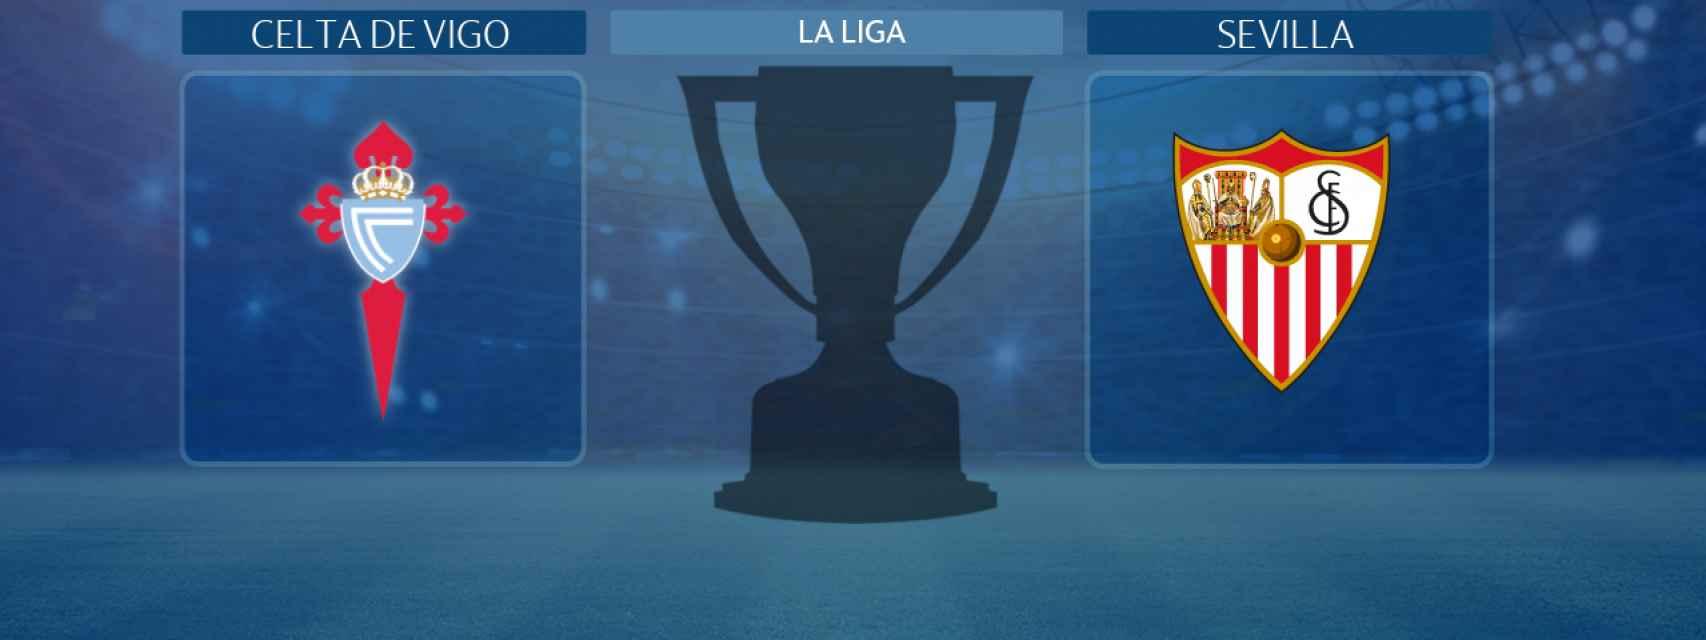 Celta de Vigo - Sevilla, partido de La Liga